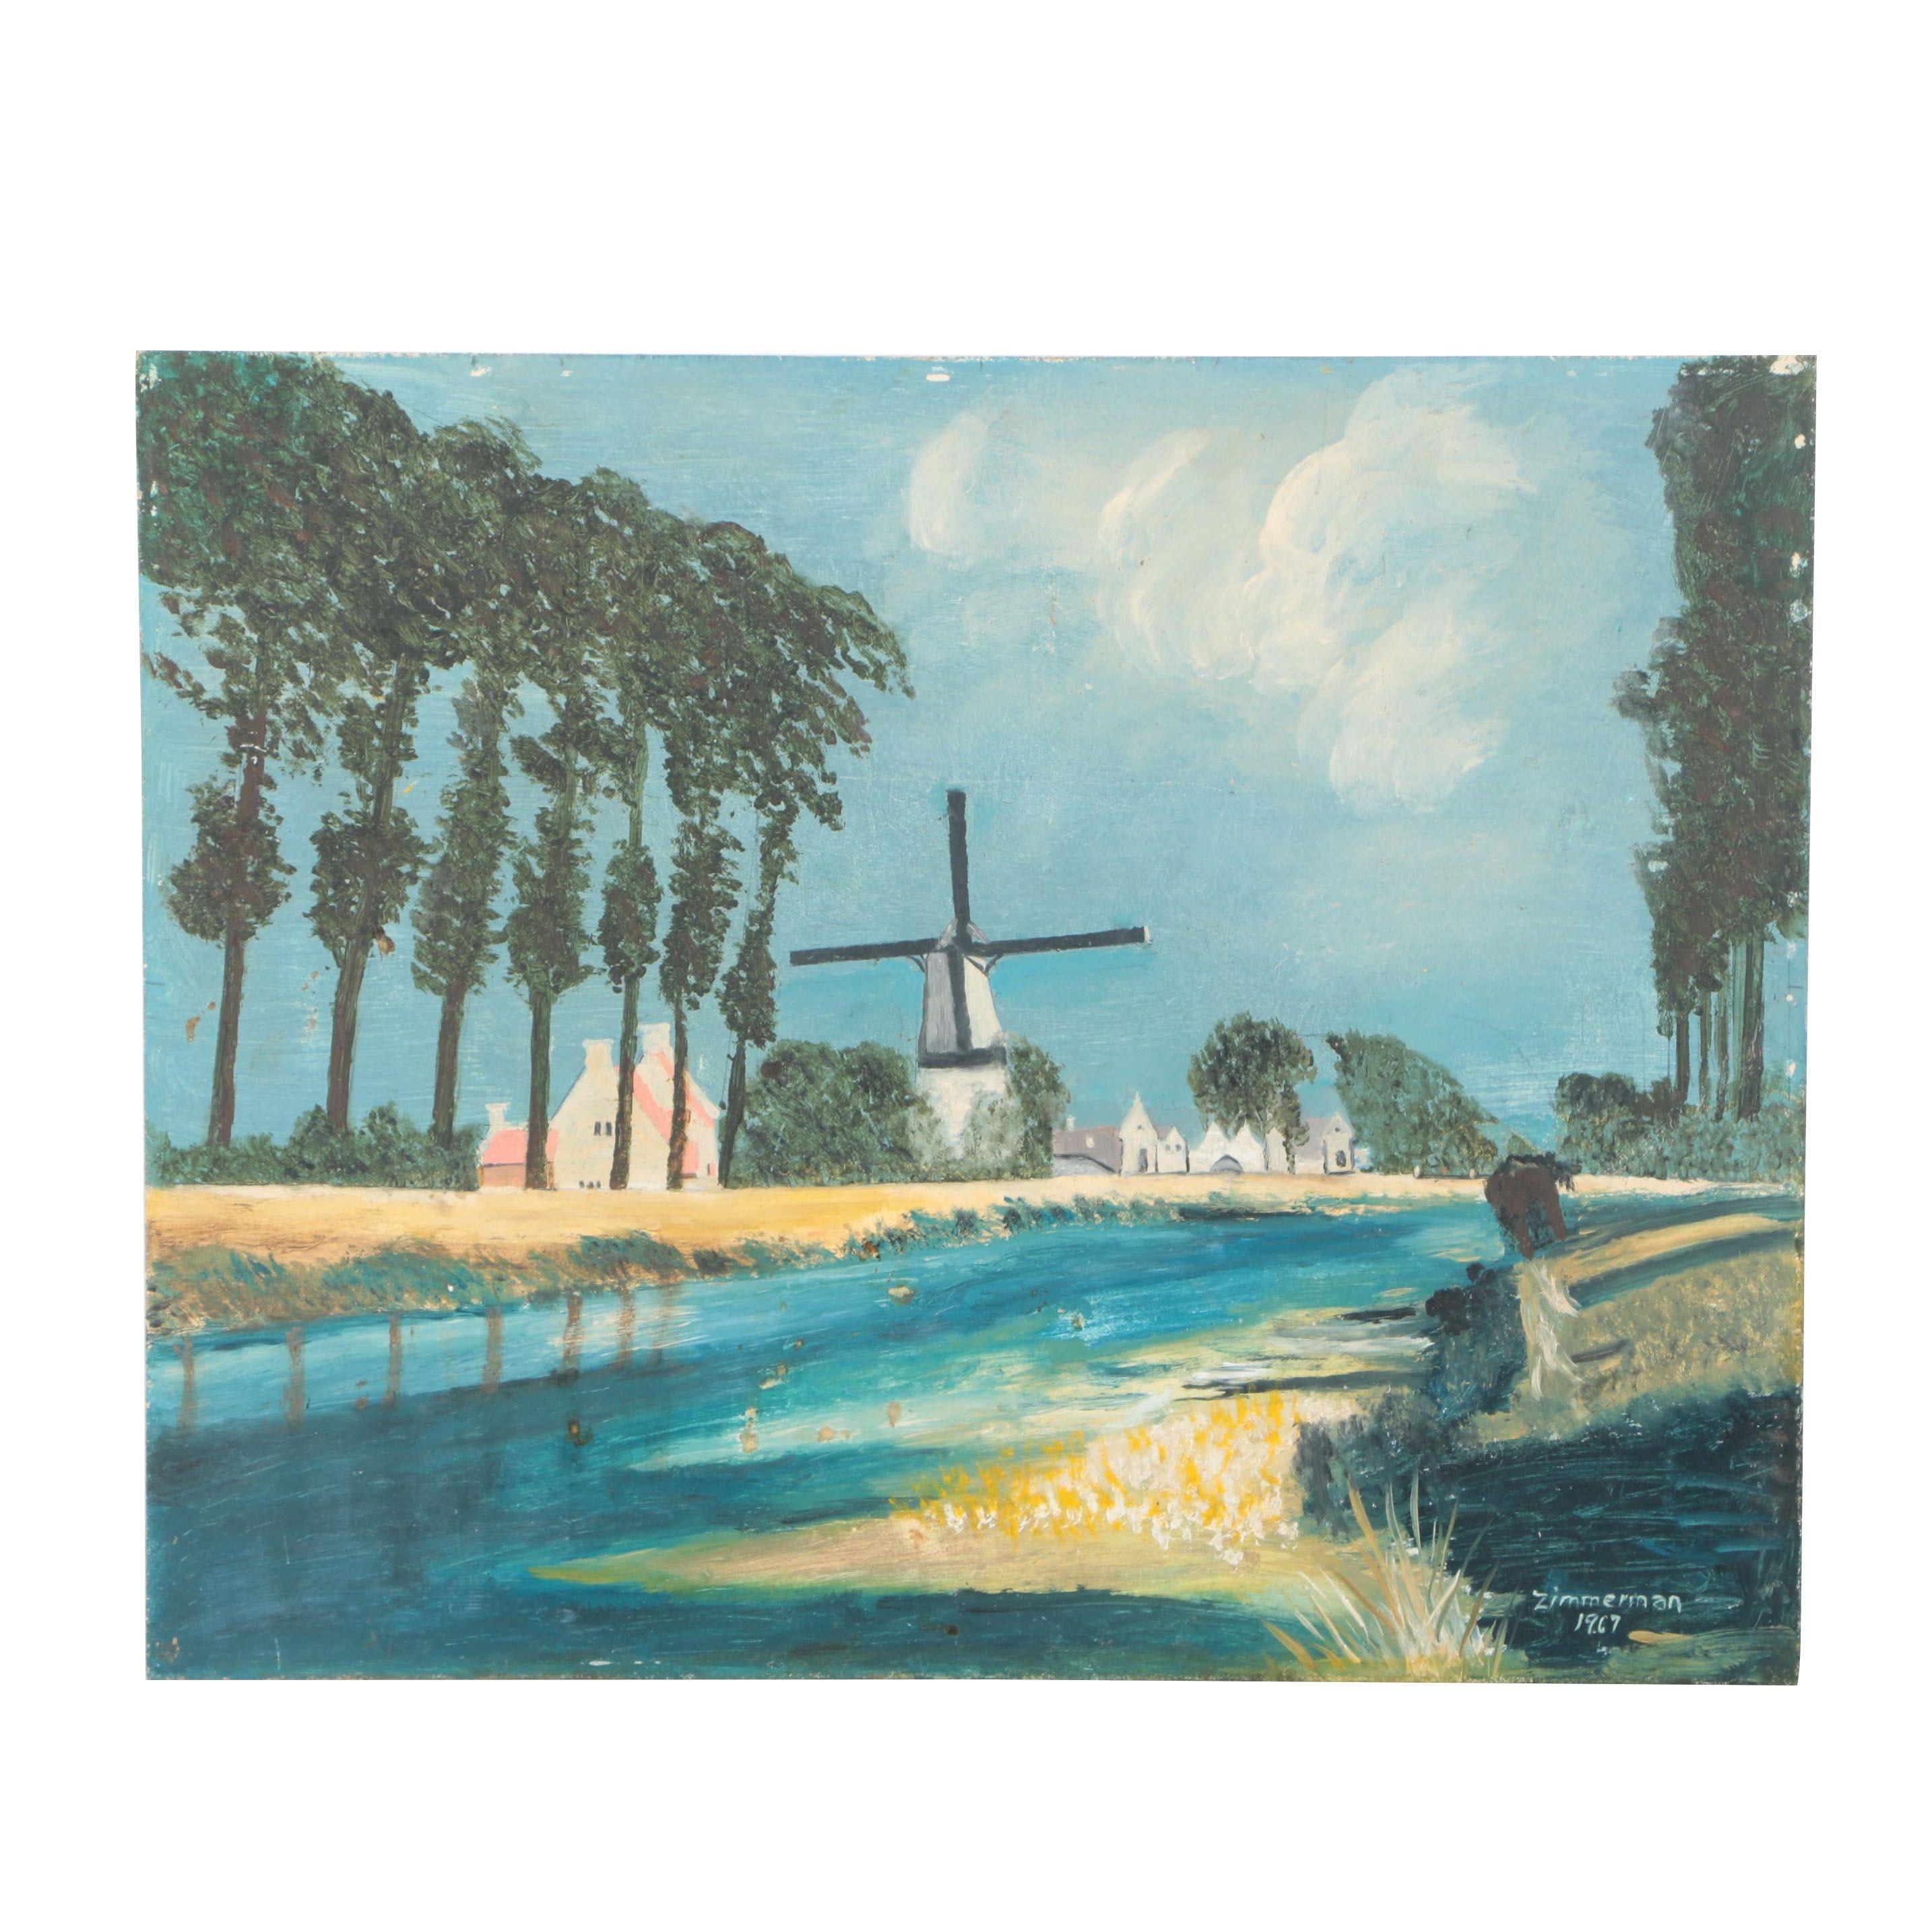 1967 Zimmerman Oil Painting of a Dutch Landscape